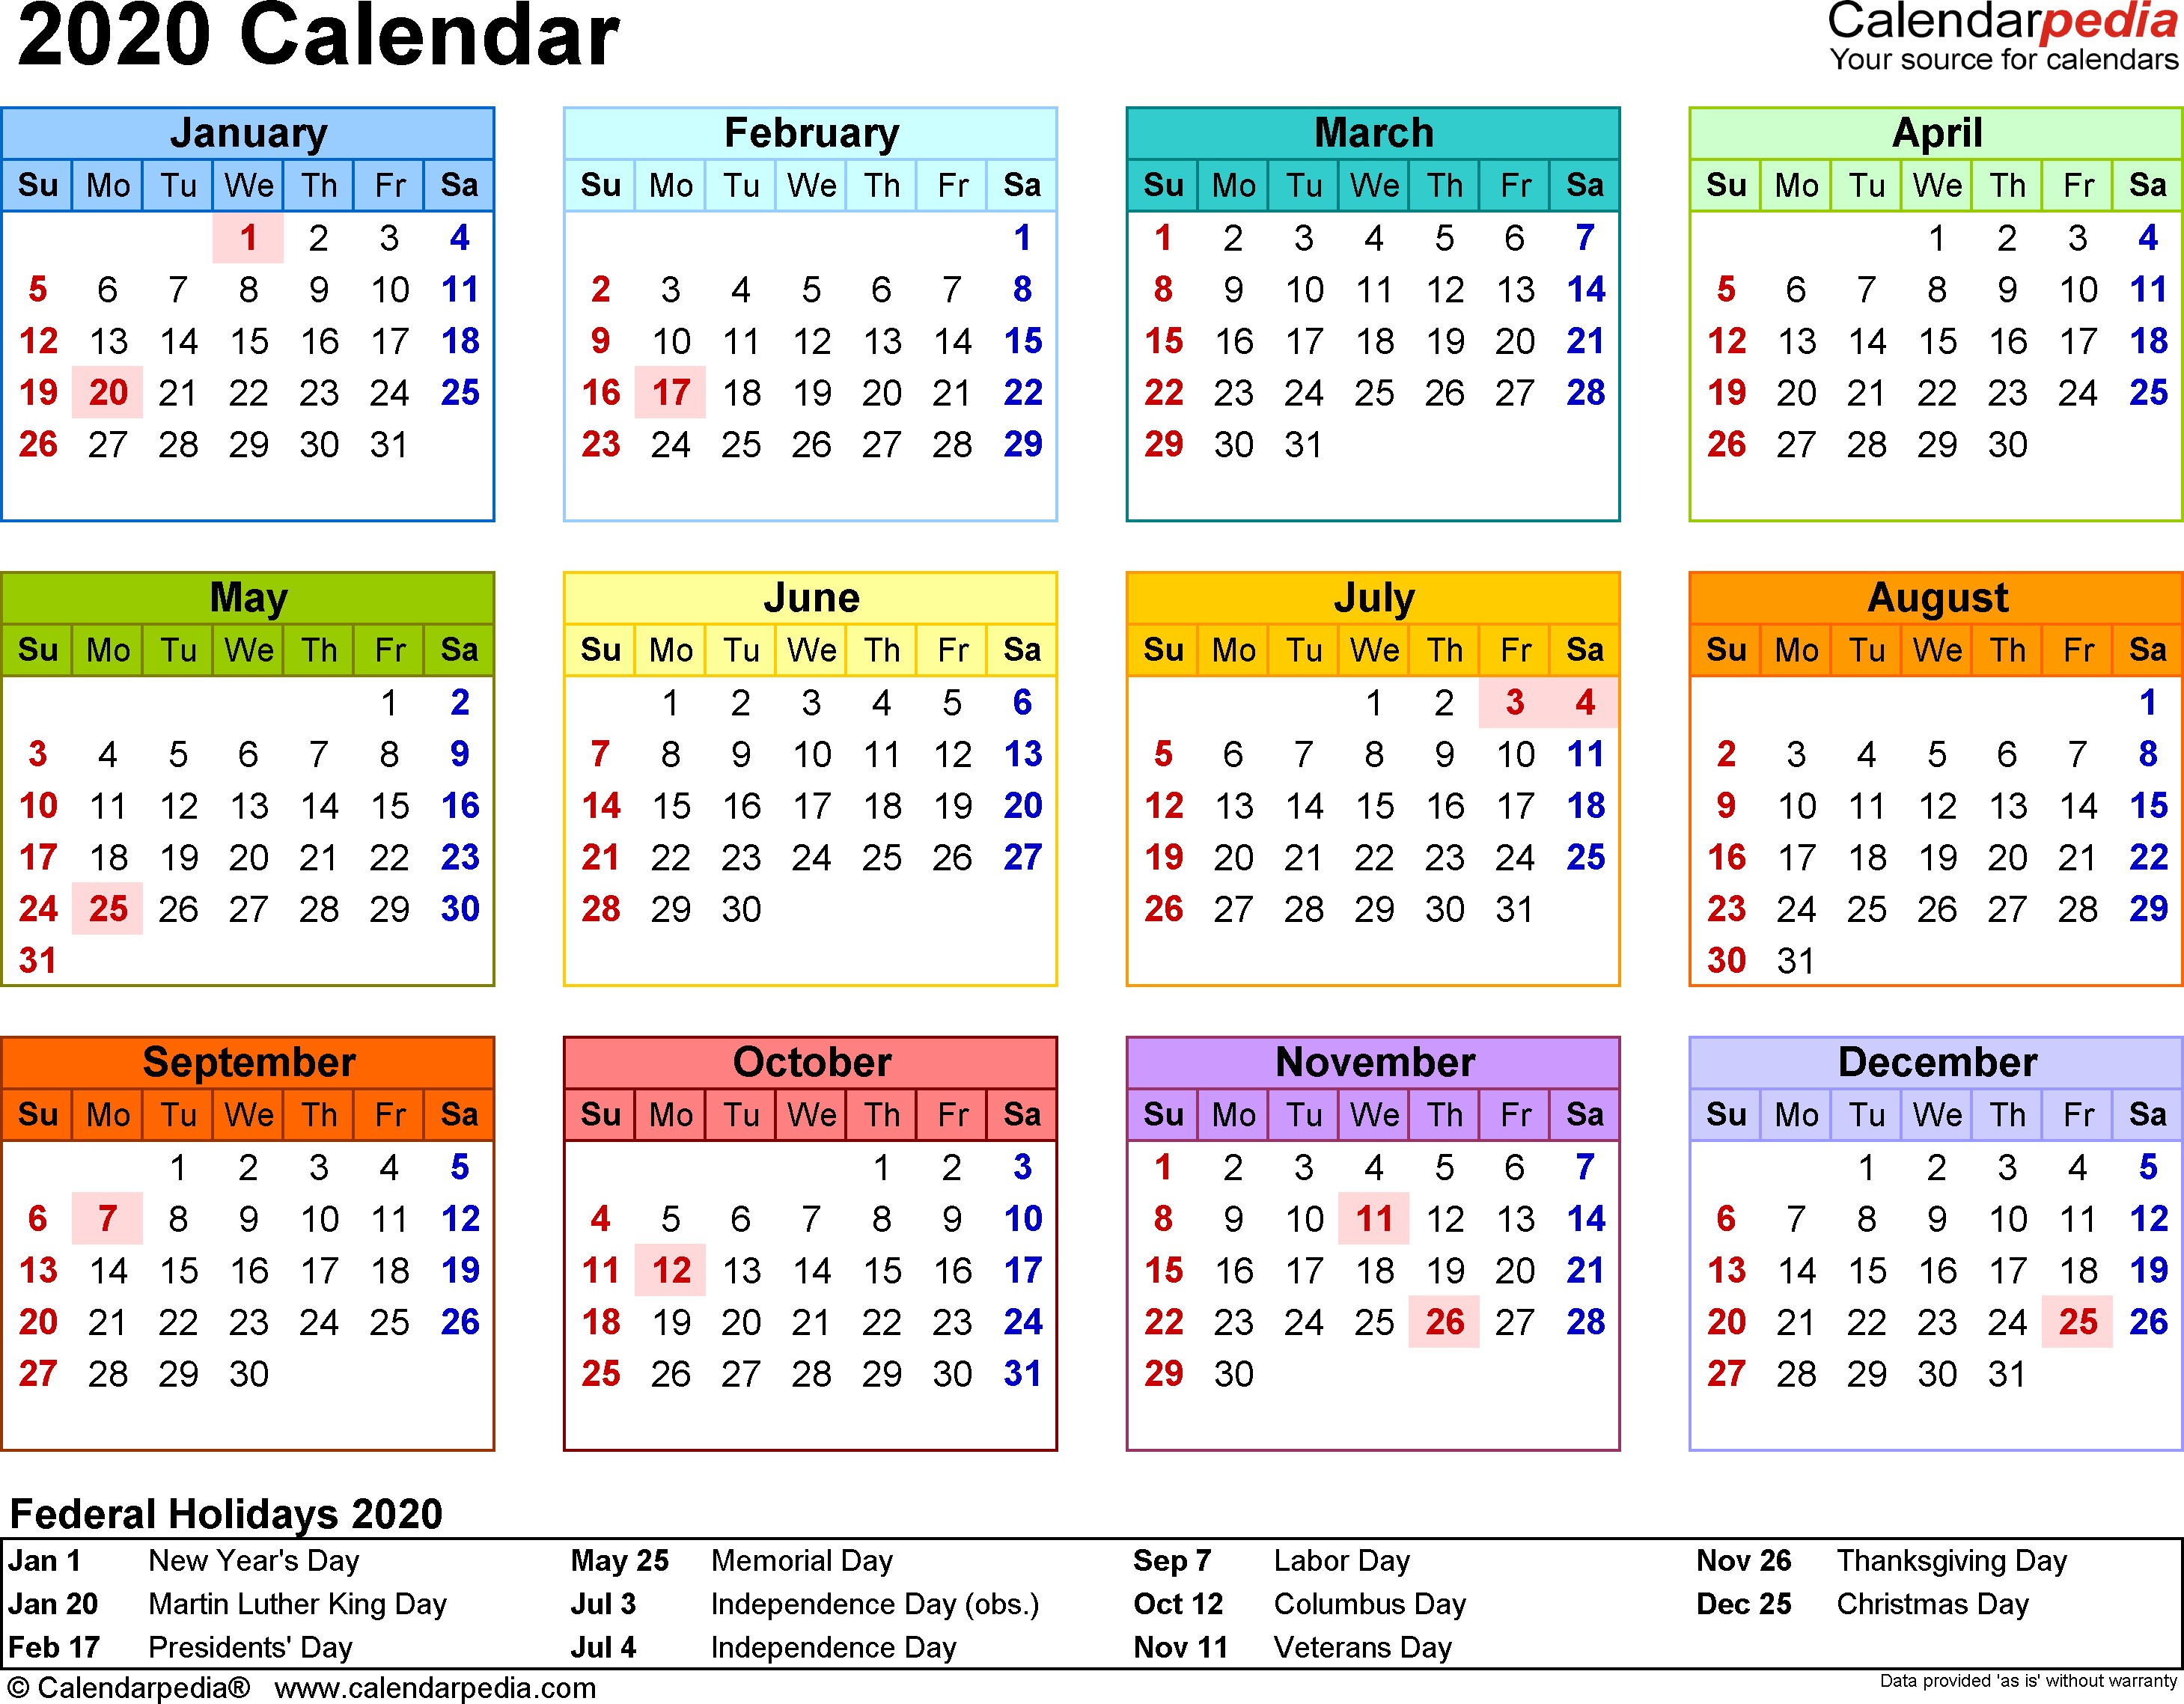 2020 Calendar Template Printable 2020 Calendar 17 Free Printable Word Calendar Templates